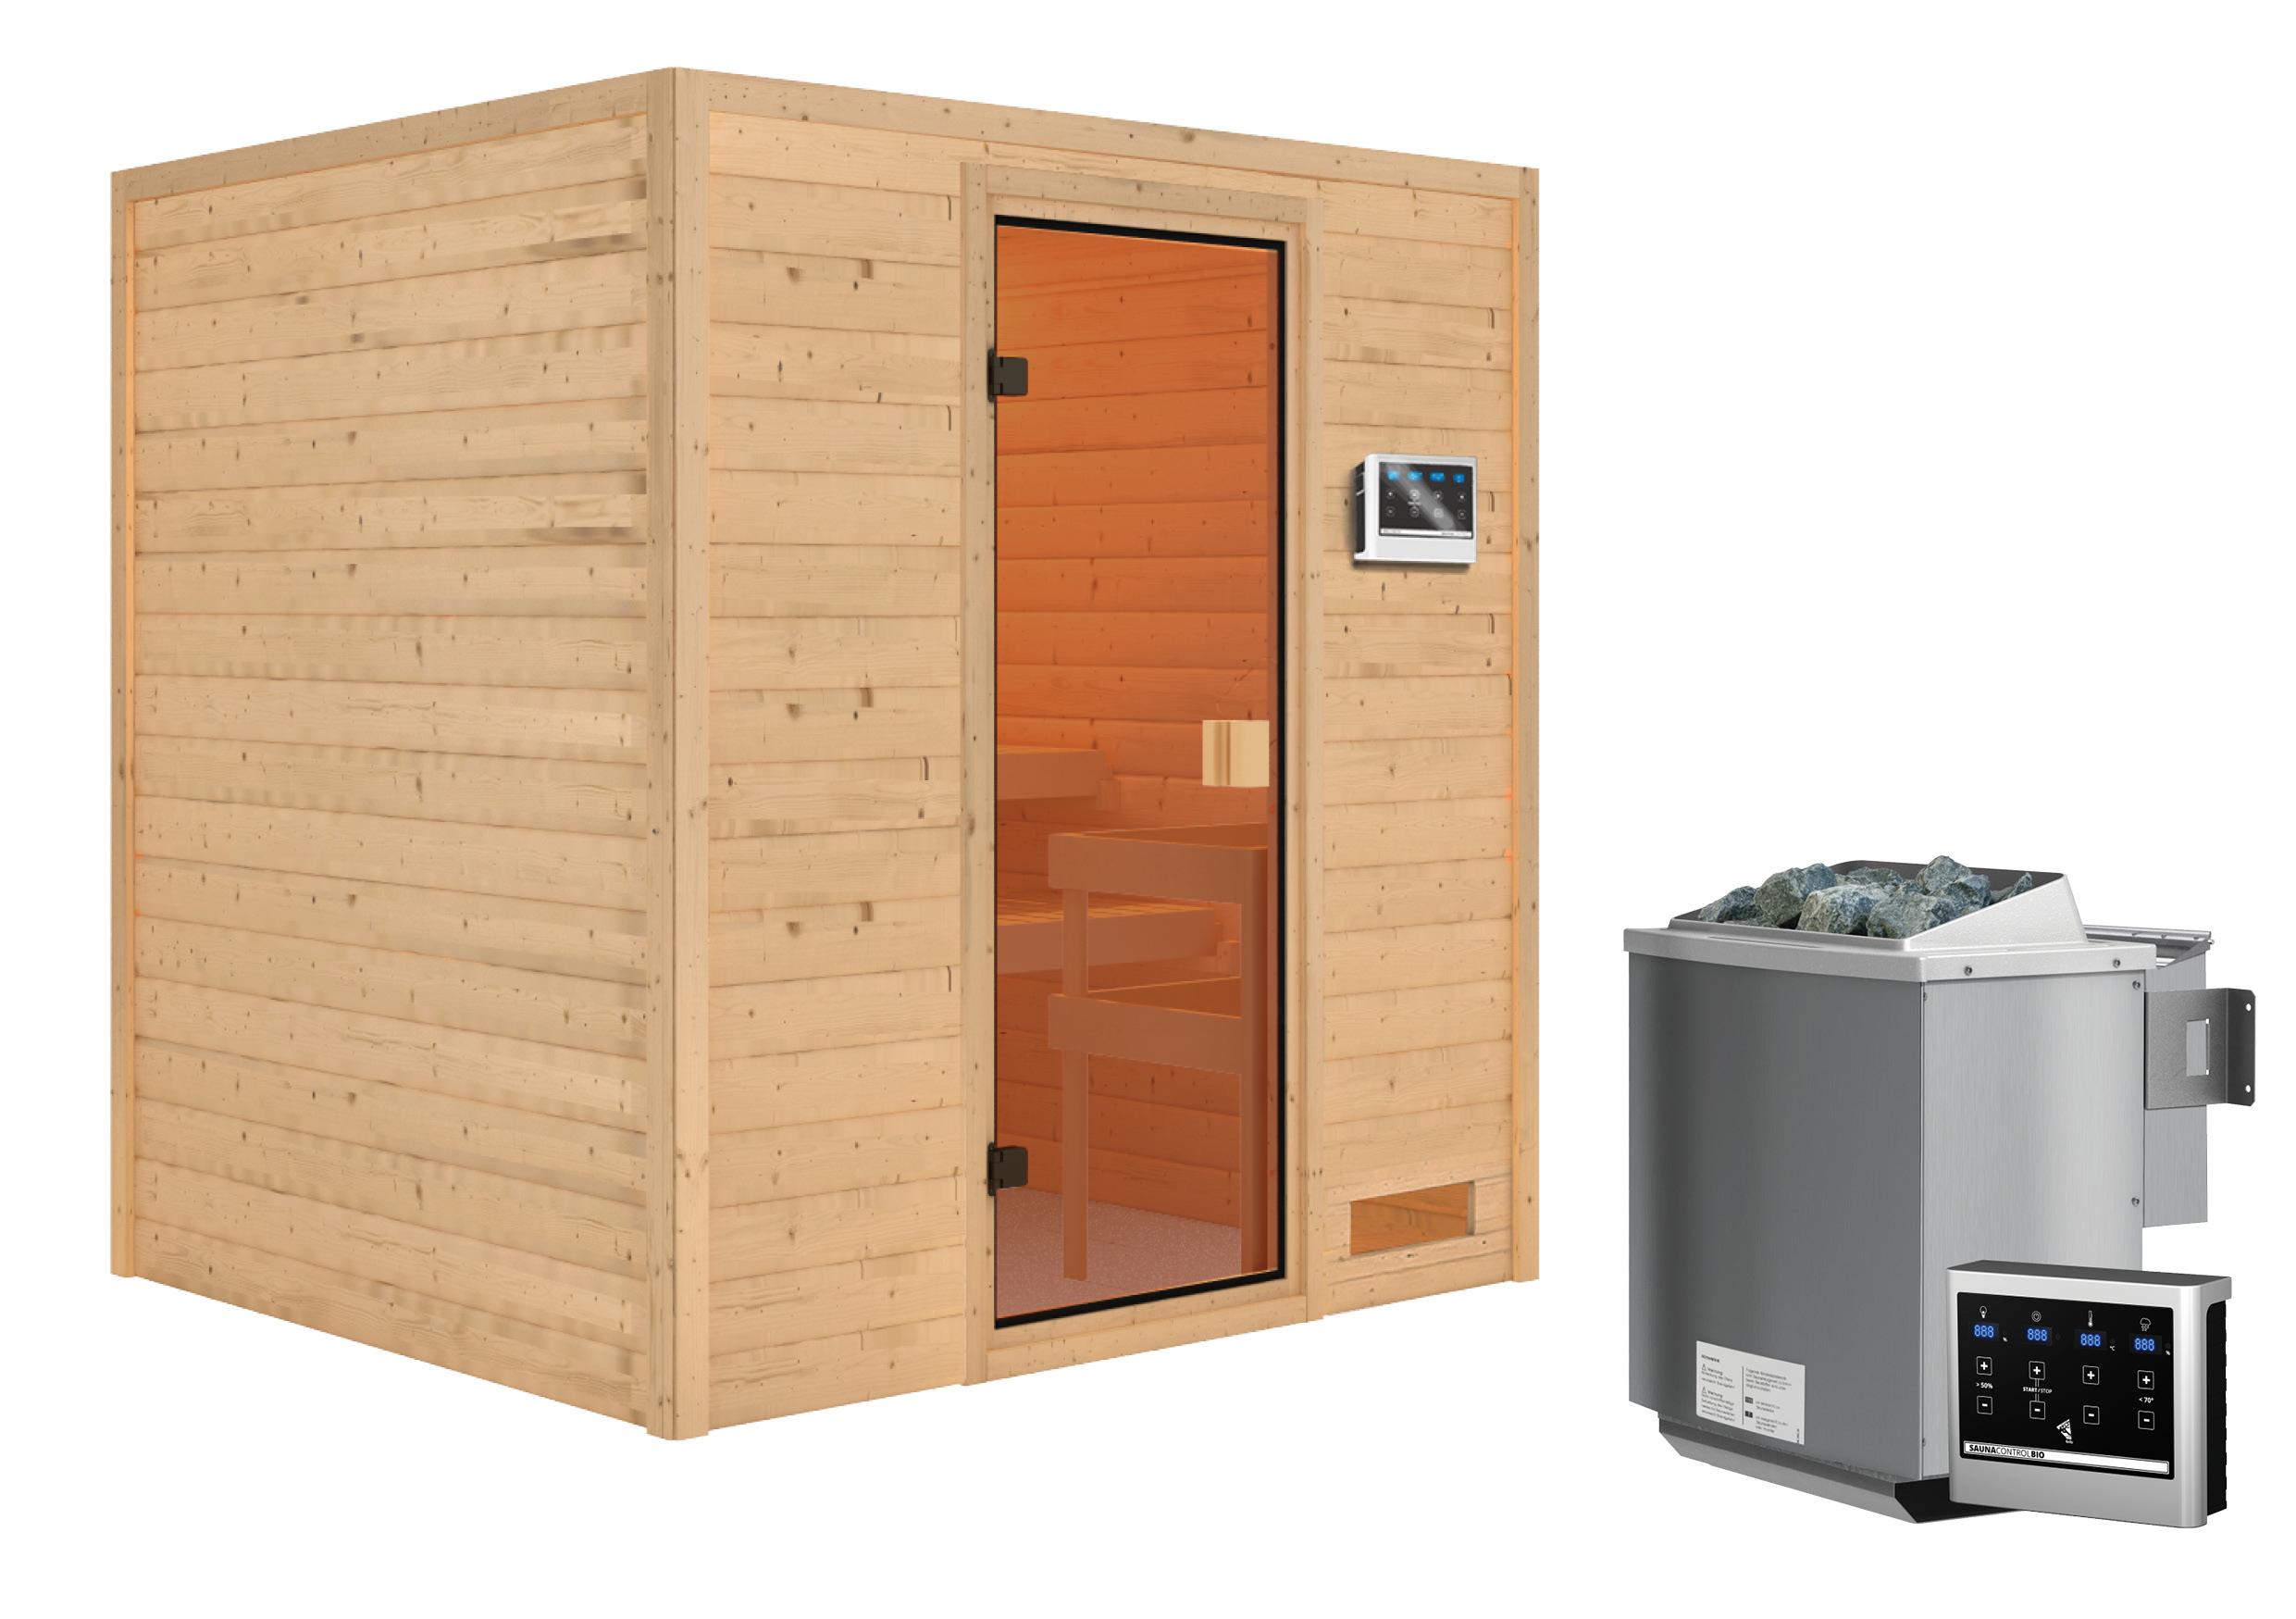 Woodfeeling Sauna Adelina 38mm Bio Saunaofen 9kW extern Bild 8